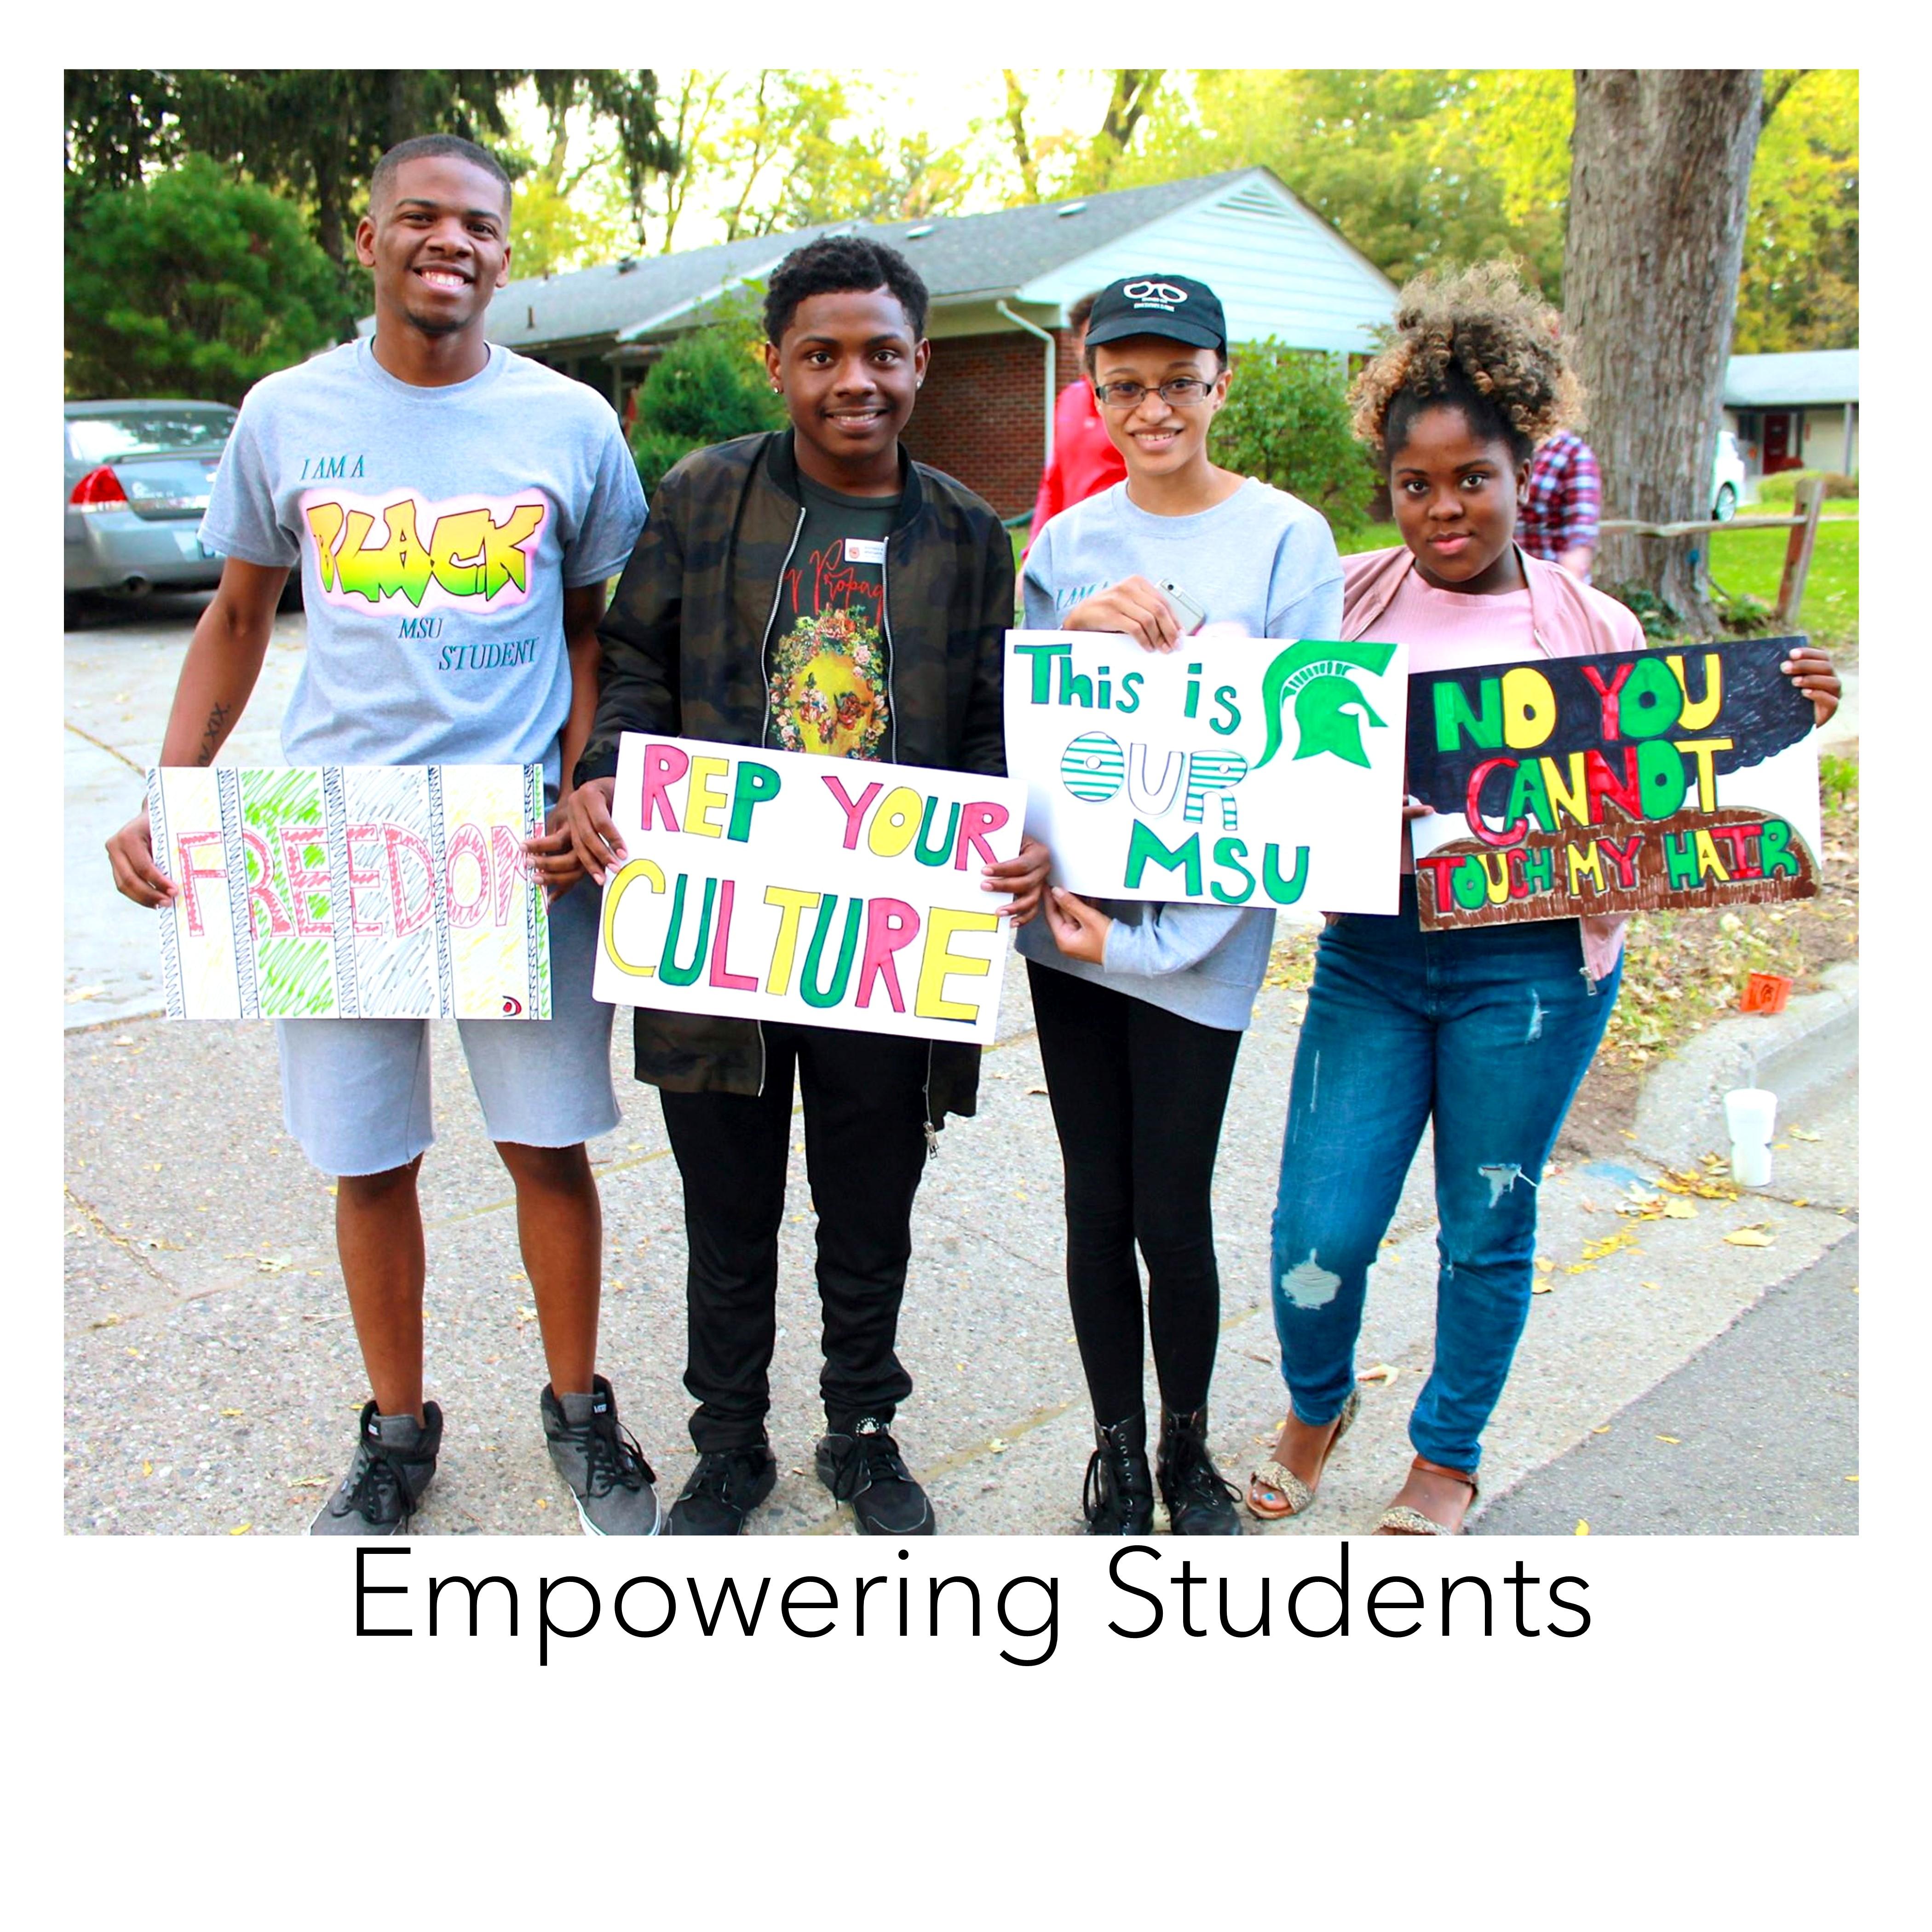 https://ocat.msu.edu/wp-content/uploads/2020/07/Empowering-Students.jpg